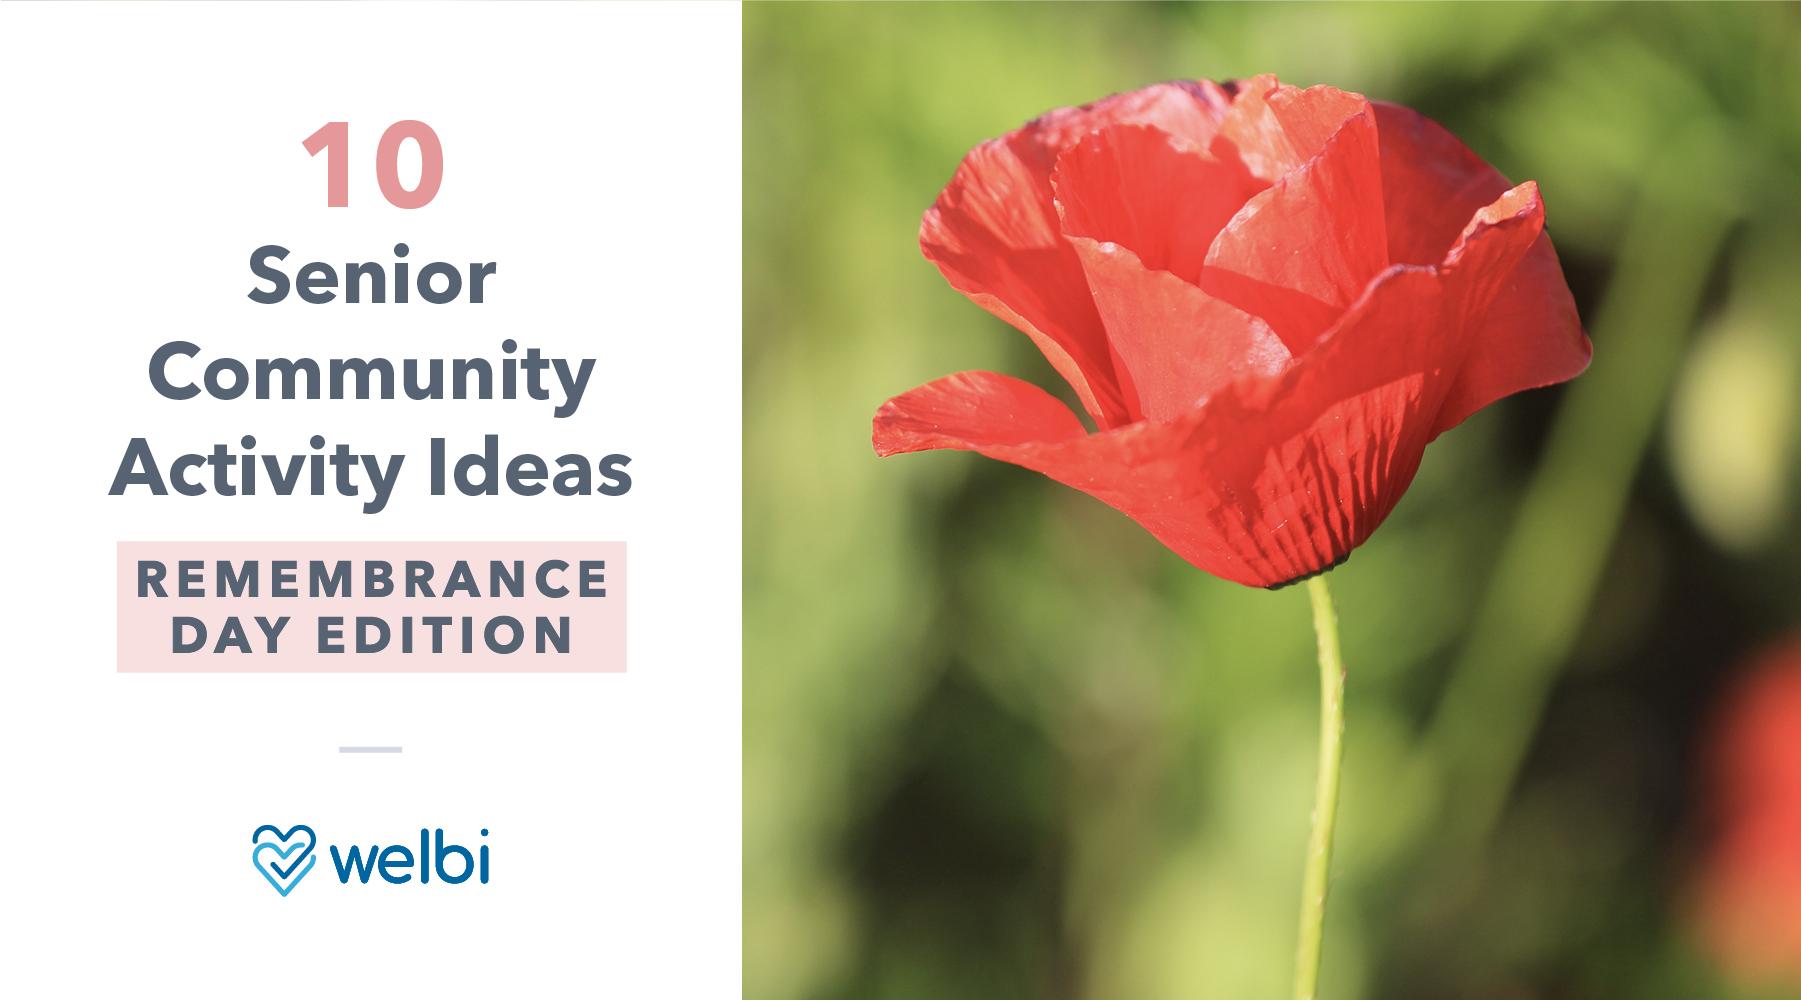 10 Senior Community Activity Ideas: Remembrance Day Edition